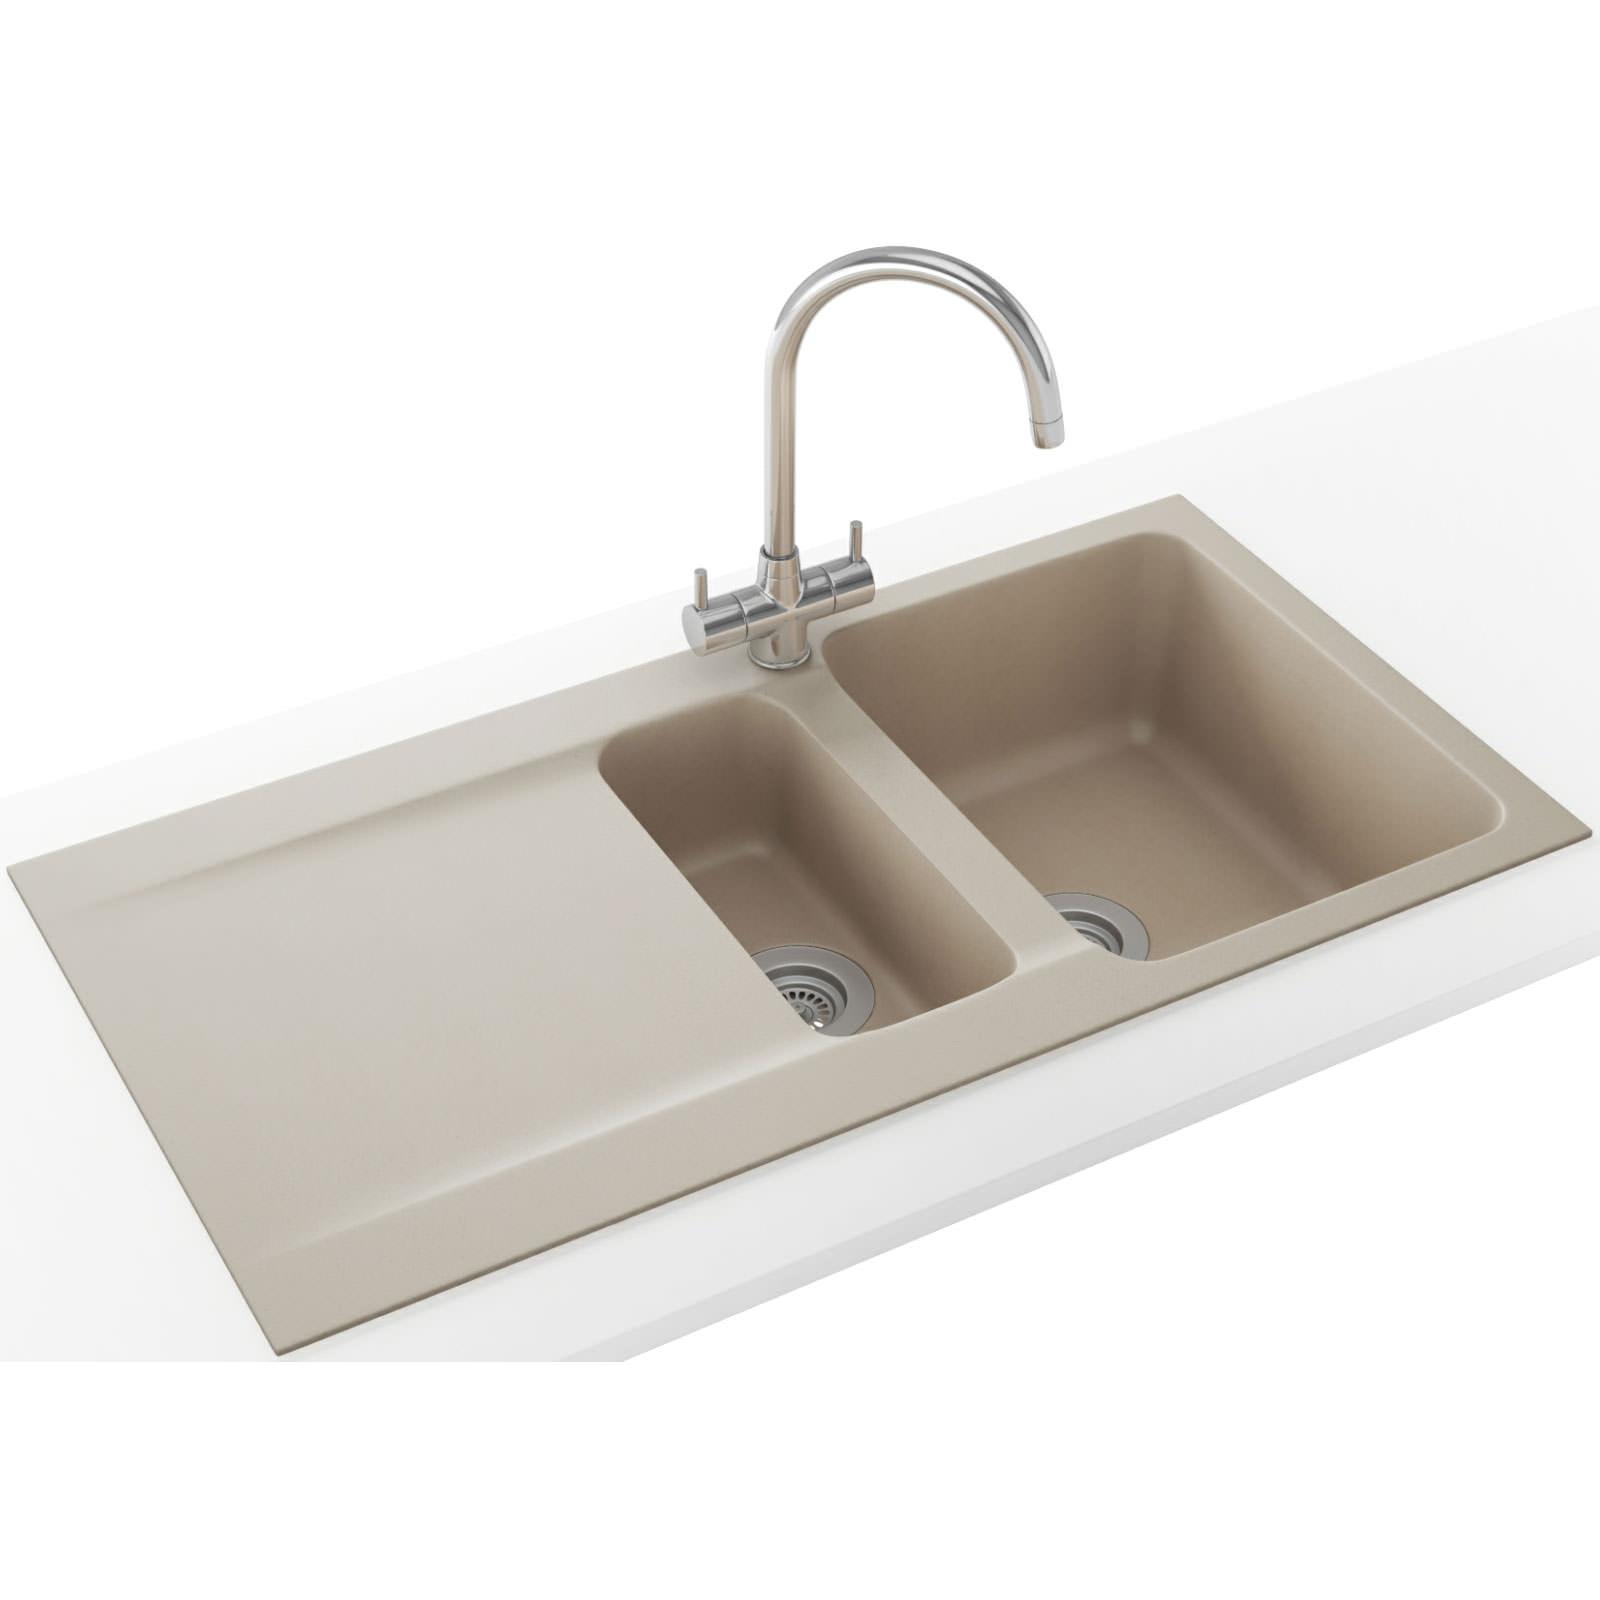 Franke Orion Propack OID 651 Tectonite Polar White Kitchen